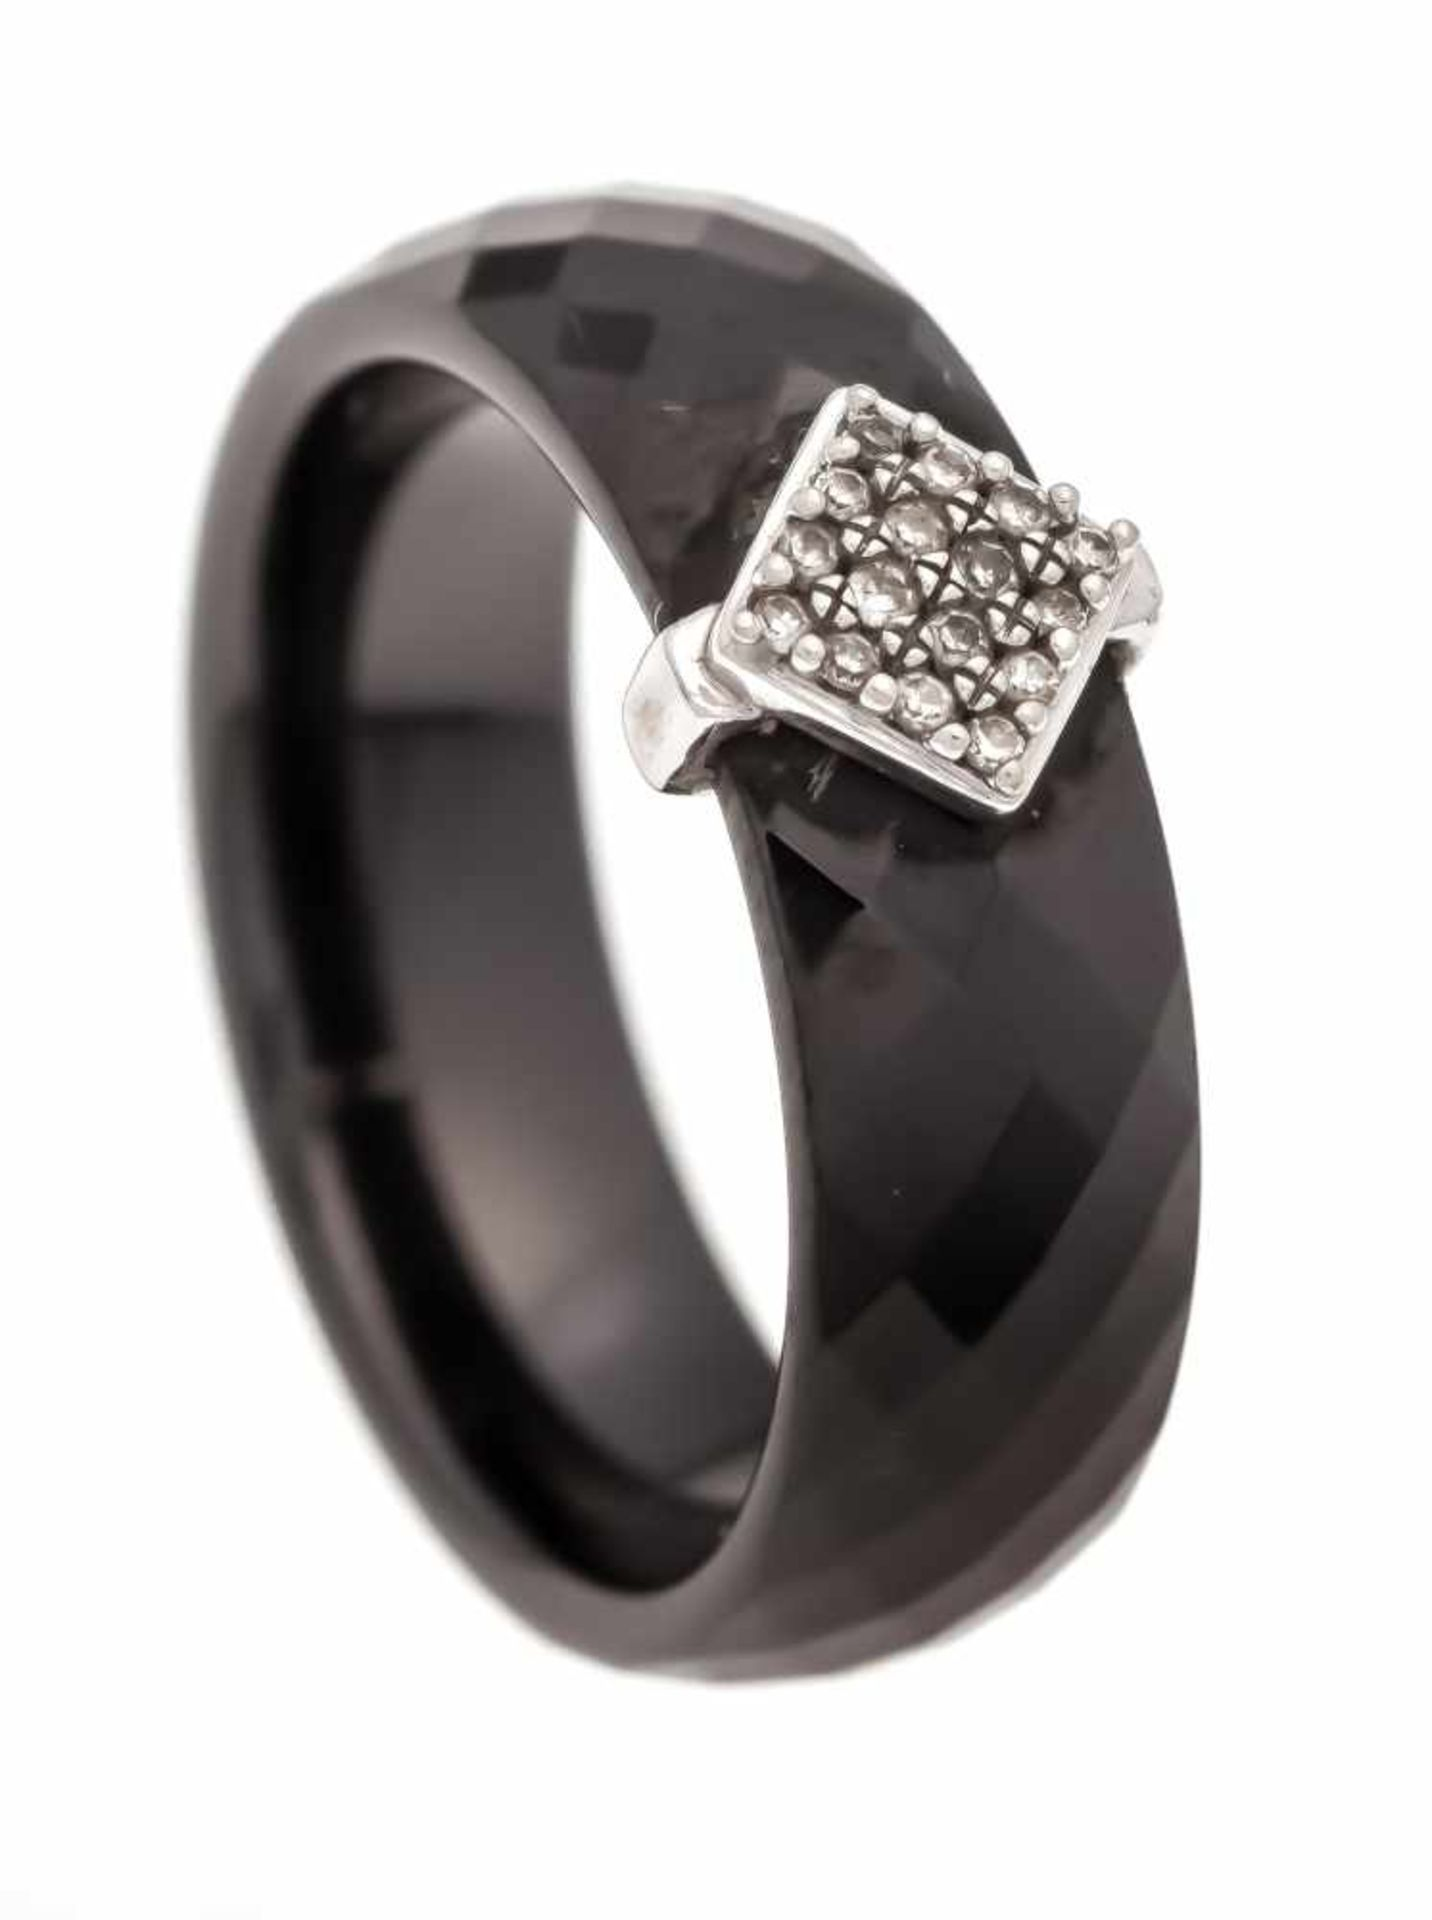 Keramik-Diamant-Ring WG 585/000 mit fac. schwarzer Keramik und 16 fac. Diamanten, zus.0,08 ct W/PI1,